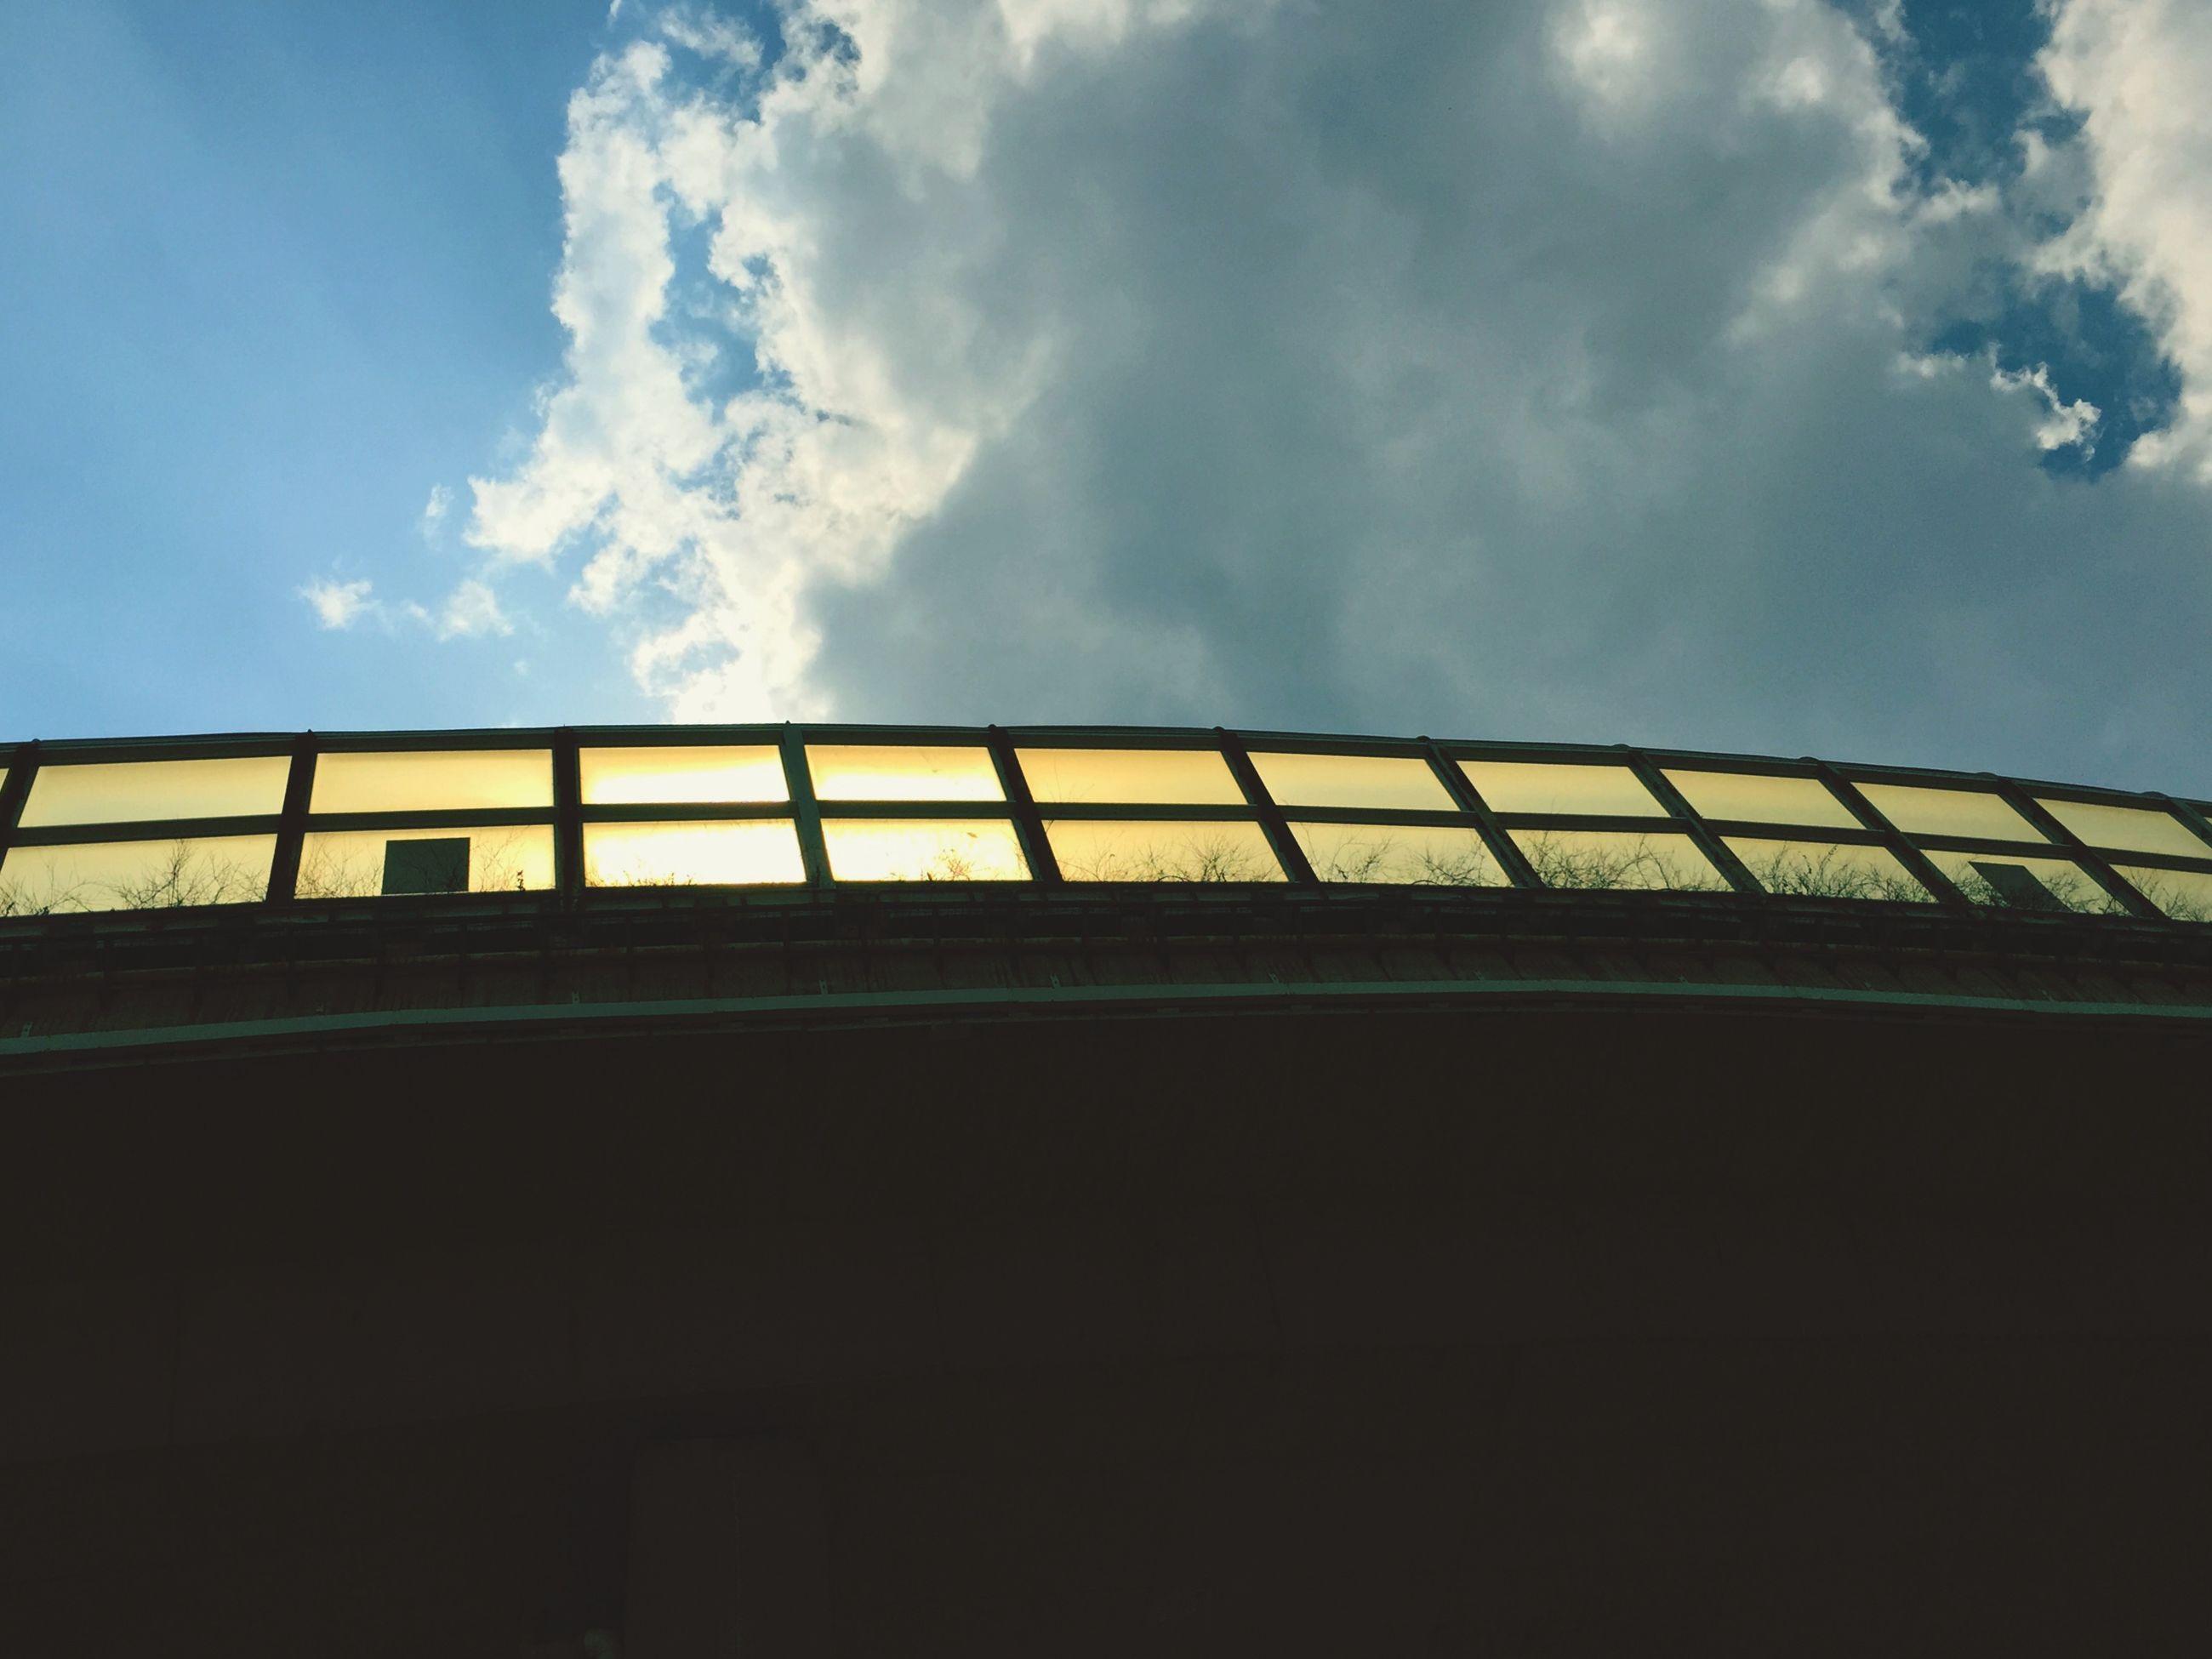 sky, low angle view, built structure, connection, architecture, cloud - sky, bridge - man made structure, transportation, railing, cloud, silhouette, bridge, outdoors, no people, cloudy, engineering, sunset, dusk, building exterior, nature